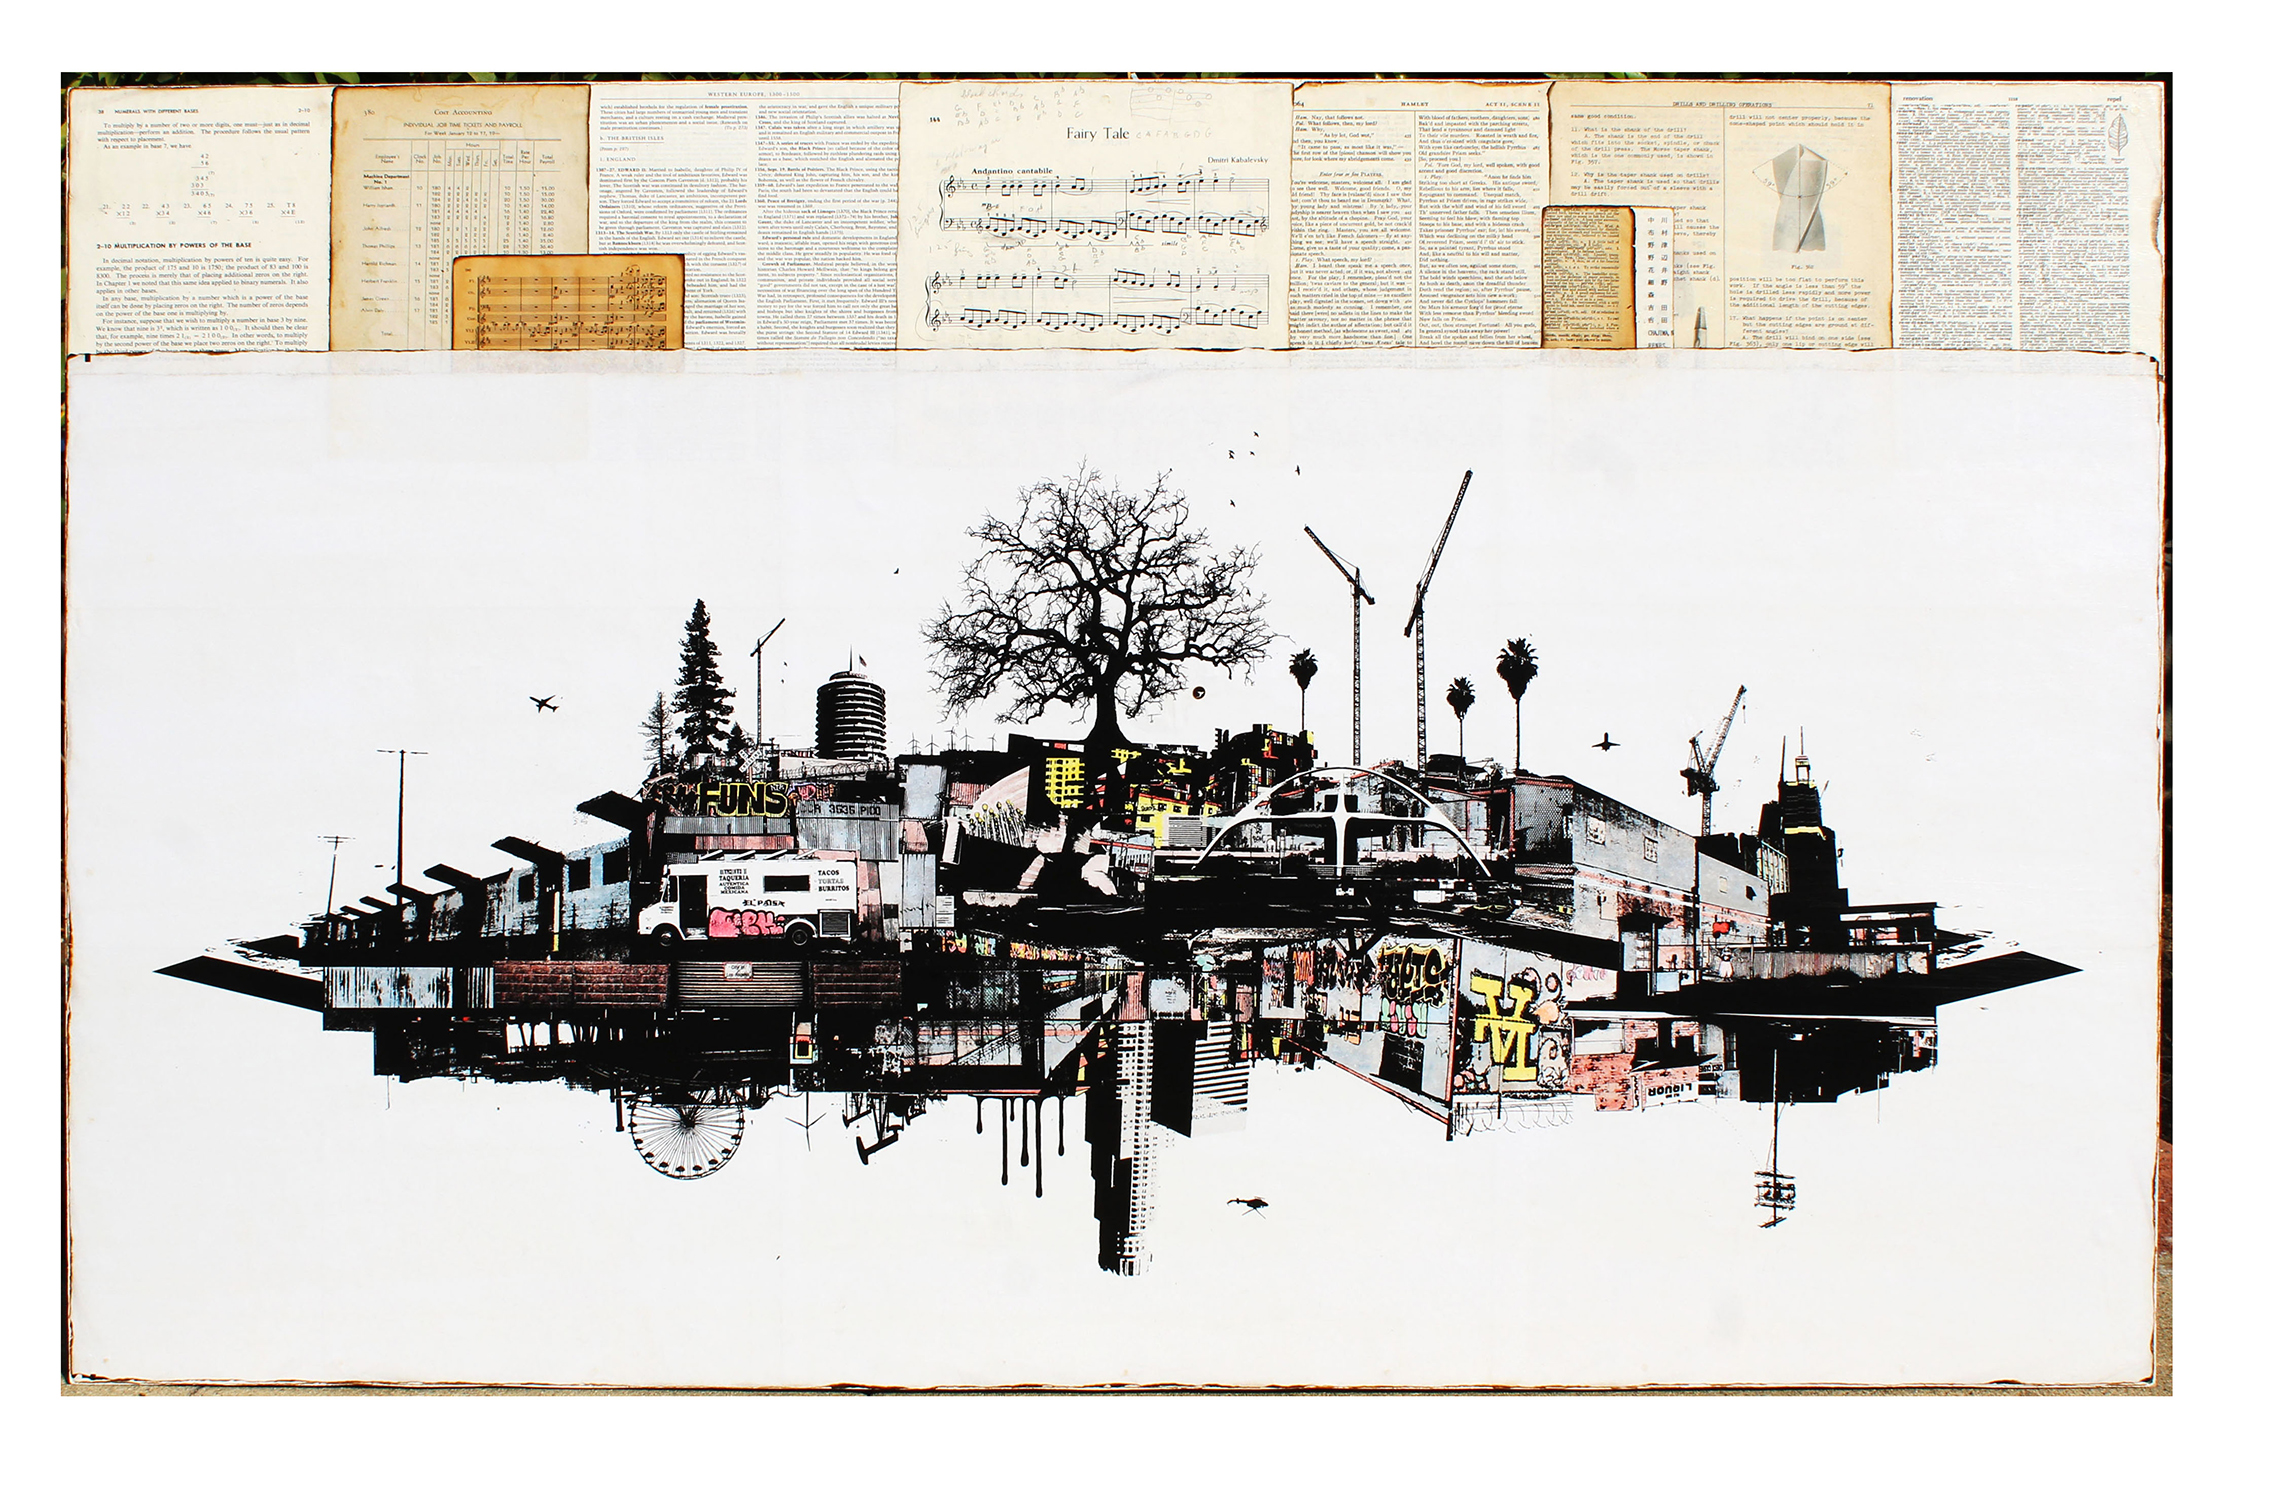 Fairy Tale by Patrick Haemmerlein @Gallery and Barrow